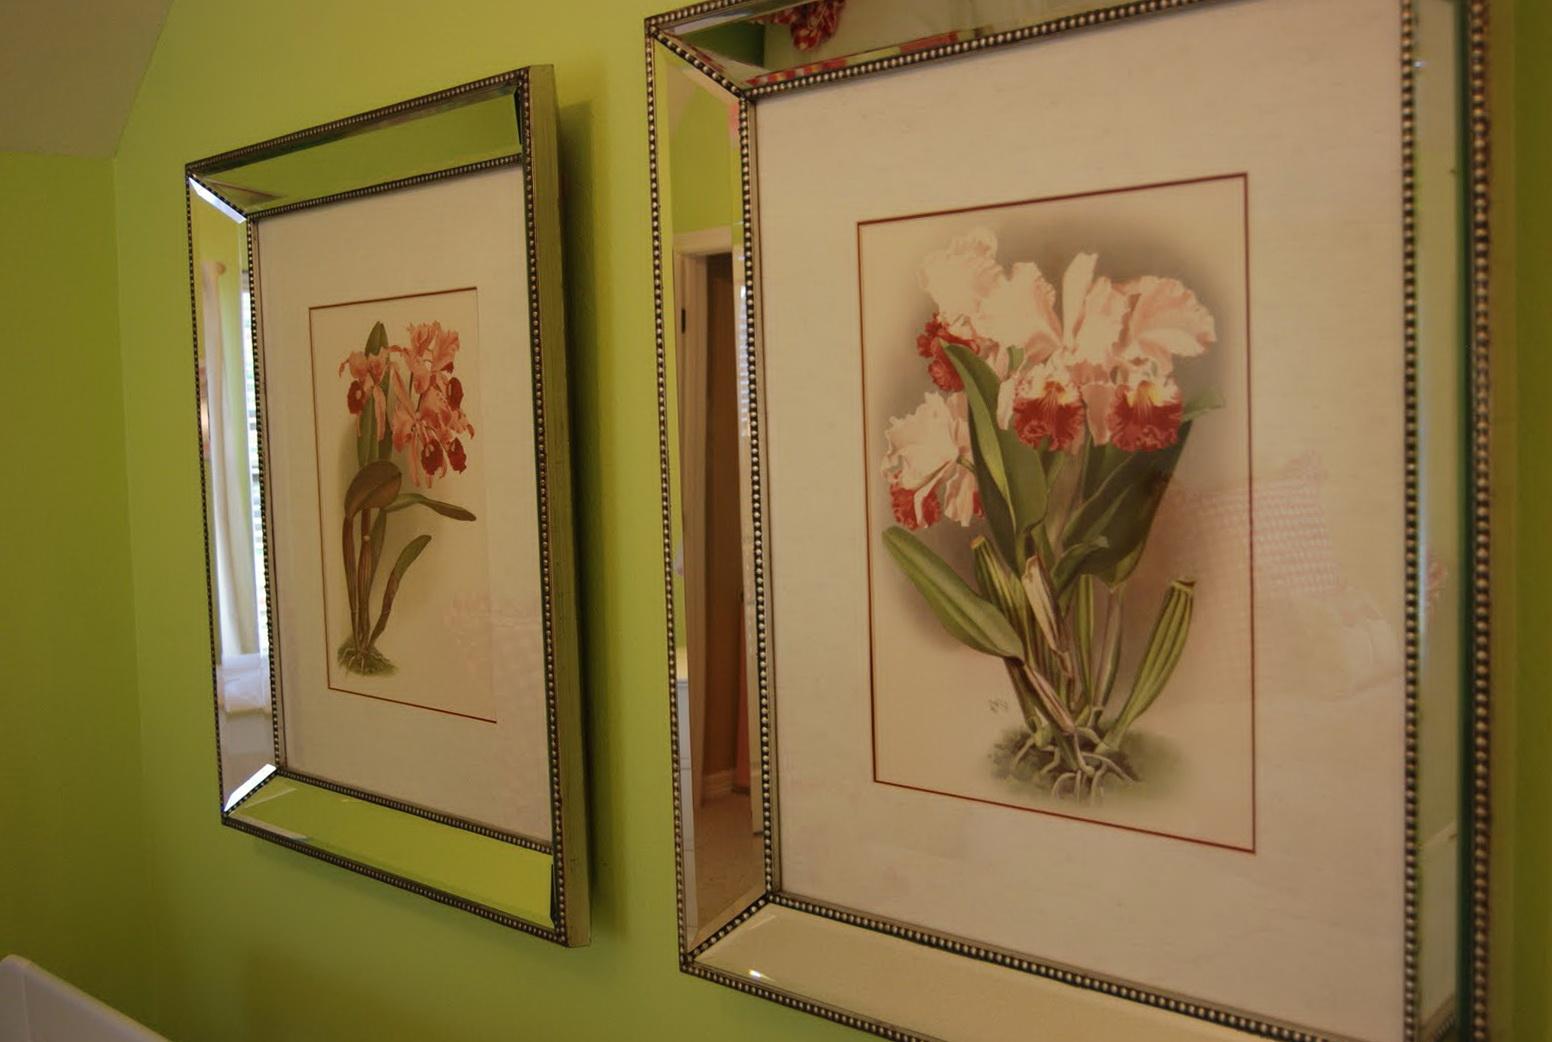 Mirror Picture Frames Uk  Home Design Ideas